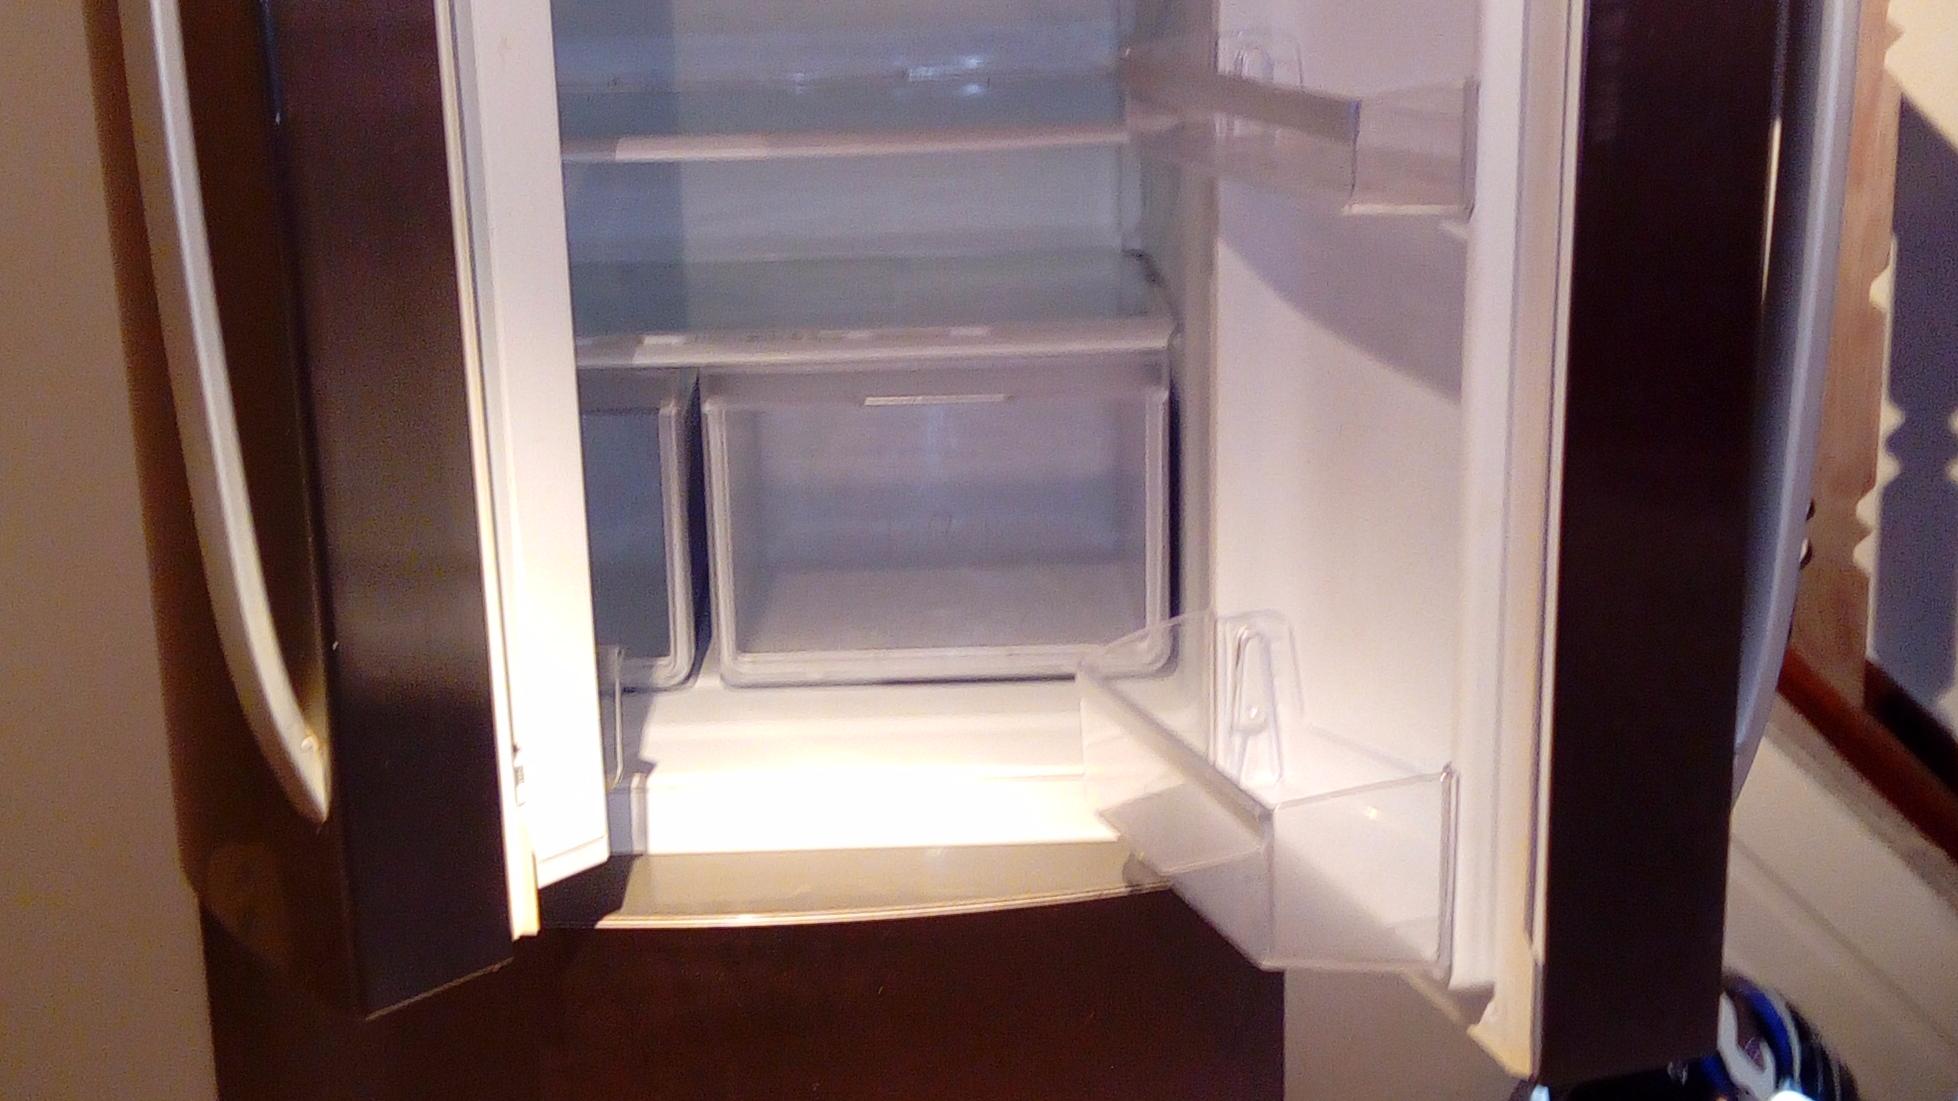 Hotpoint Ariston Quadrio Fridge Freezer For Sale Home